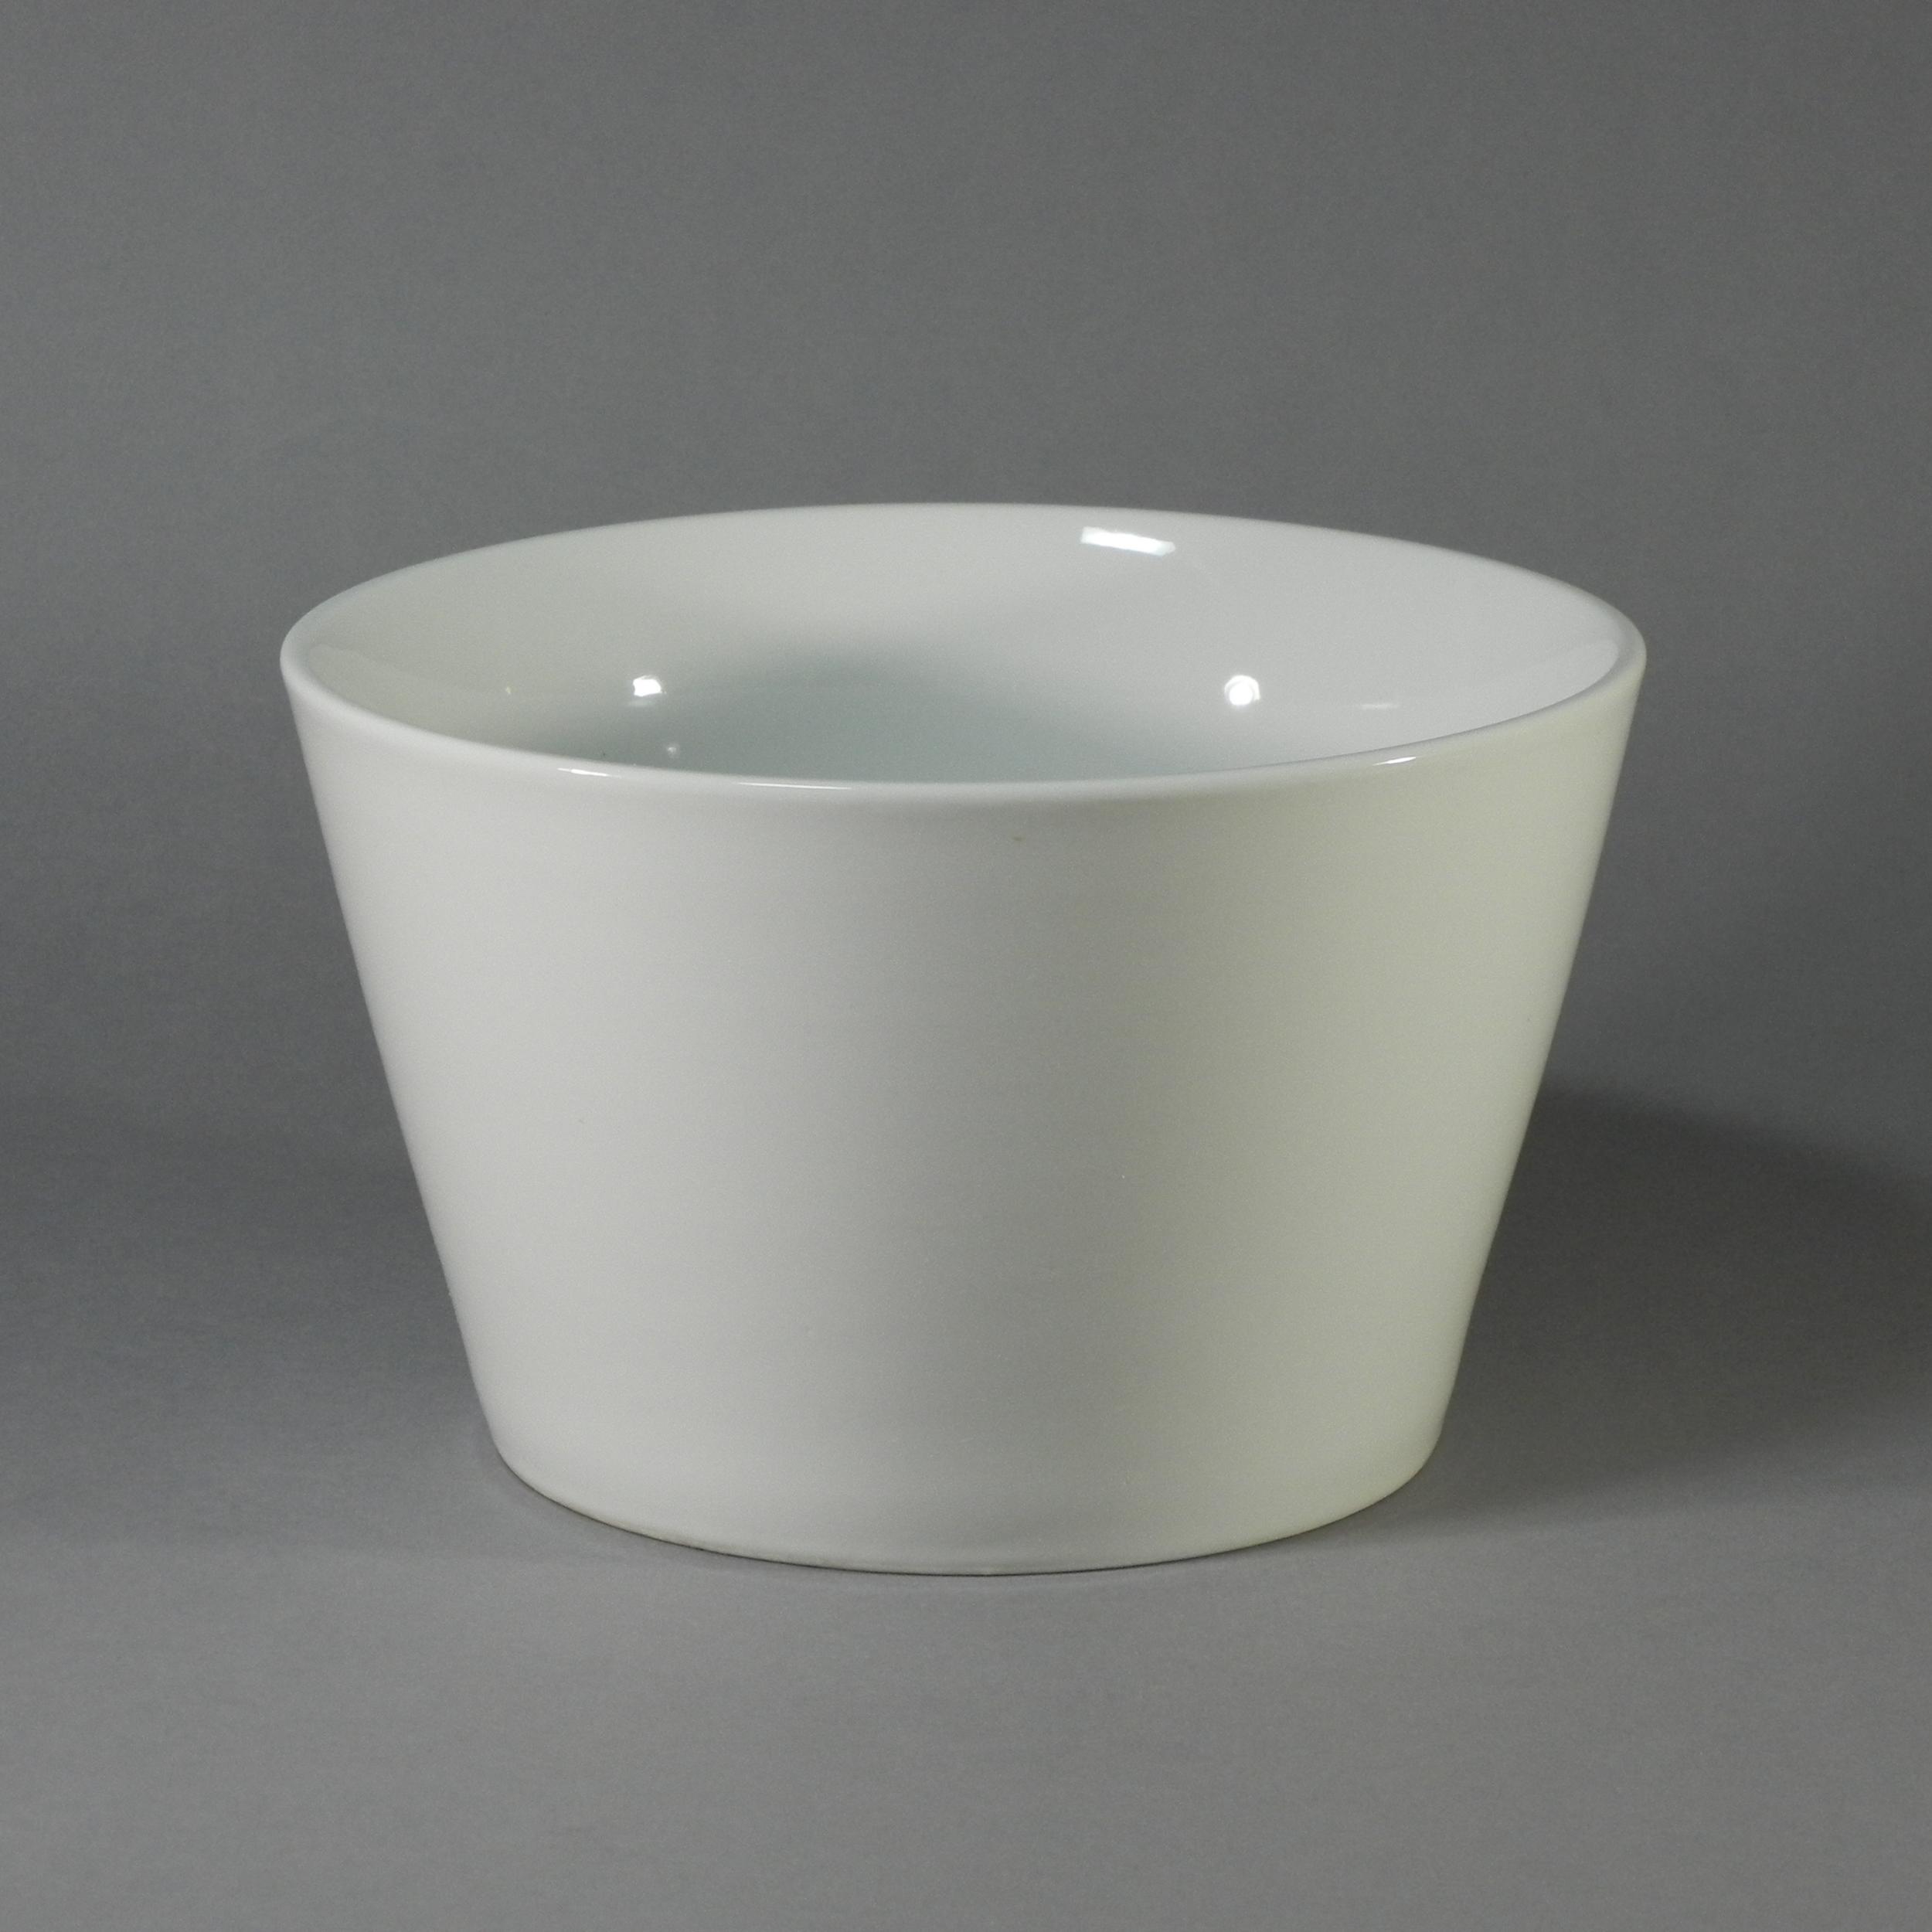 "Porcelain Round Bowl - R 3 Quart - (8.5""x5.5"")"